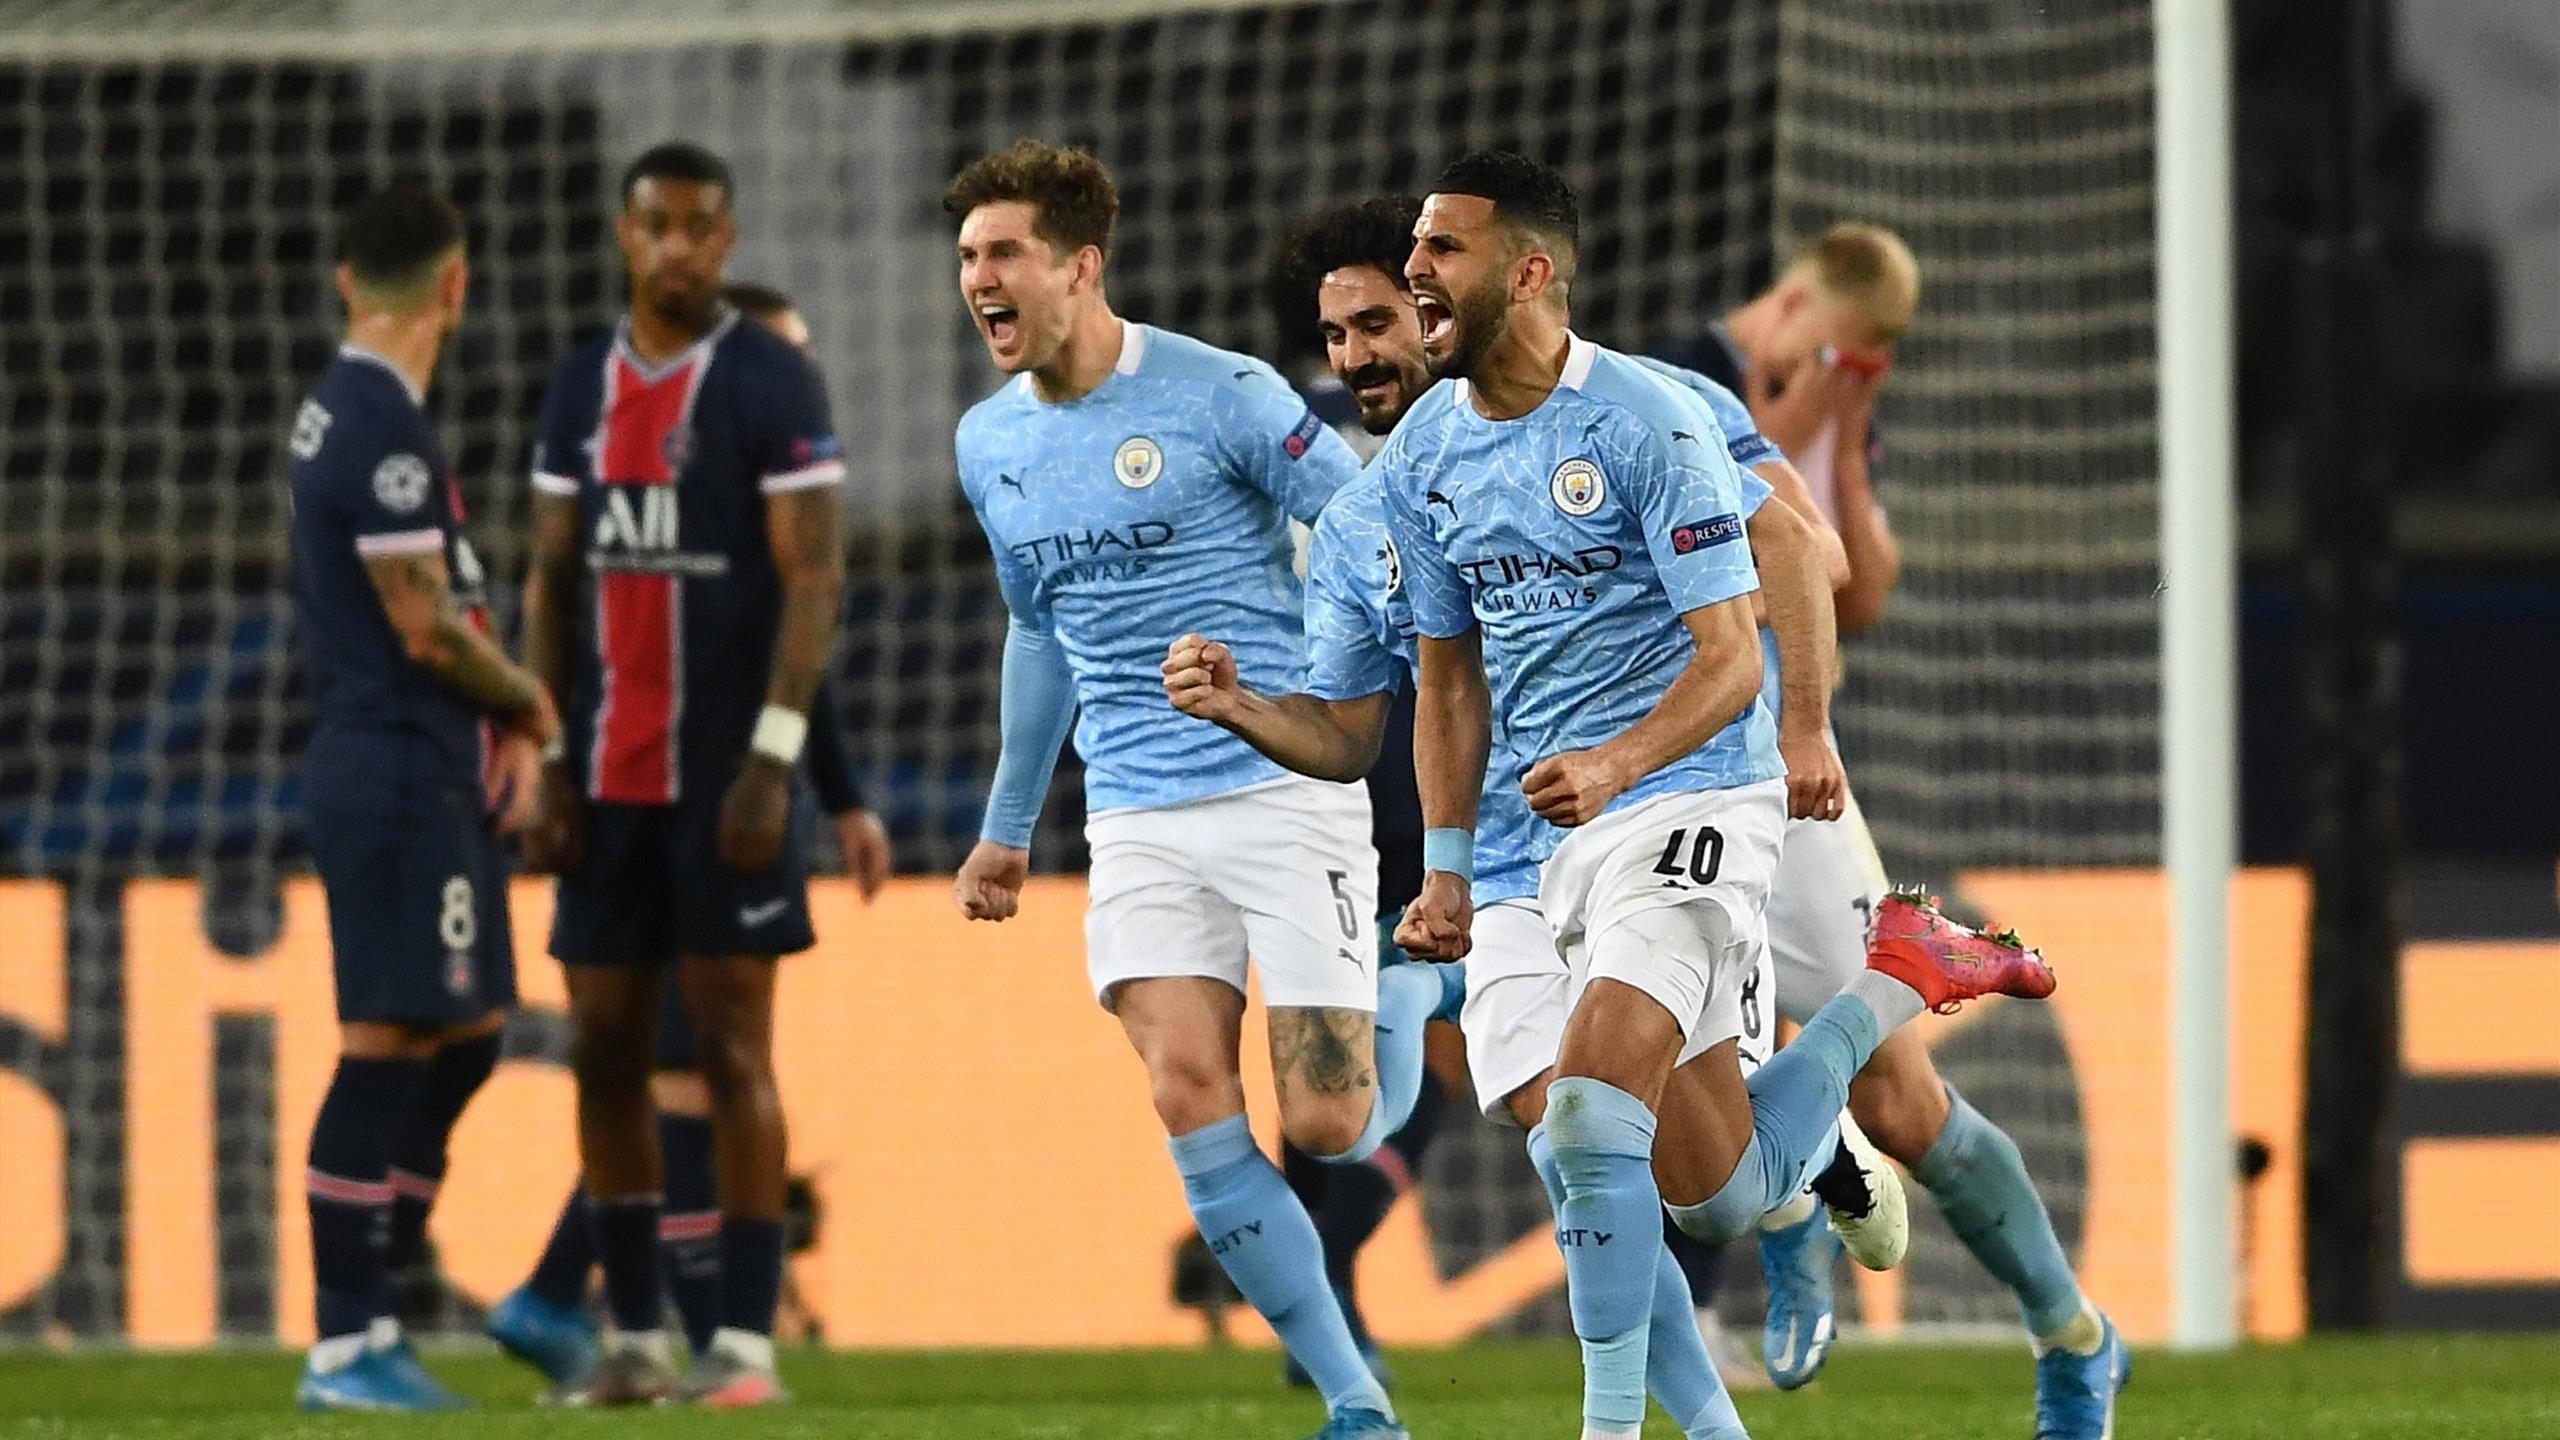 Riyad Mahrez free-kick gives City away win as ten-man PSG fall to pieces in  chaotic second-half - Eurosport